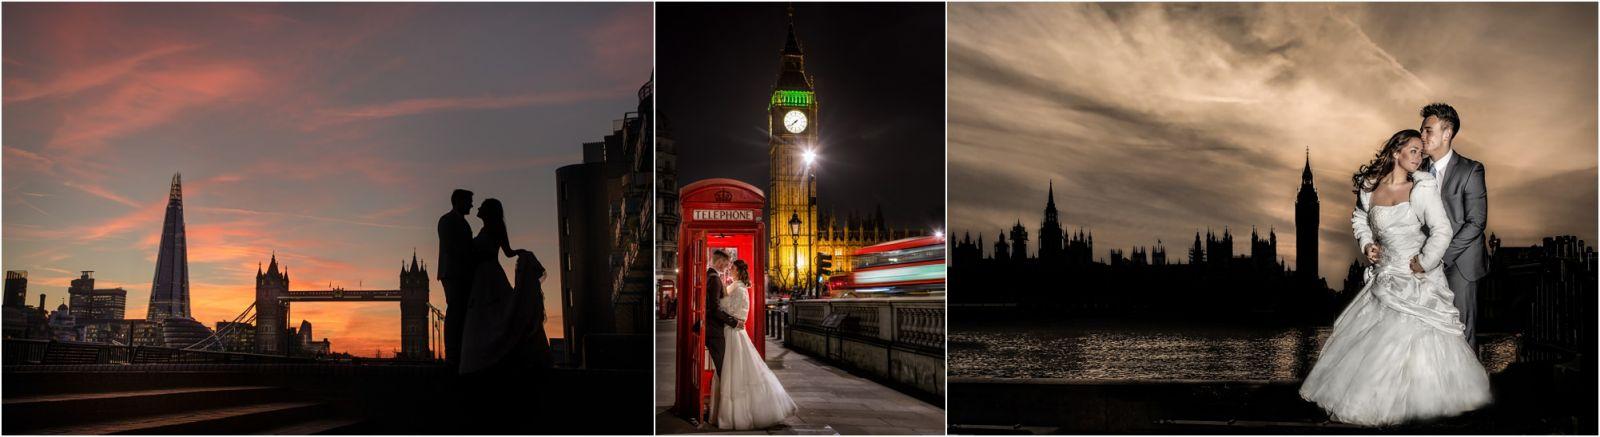 London Wedding Photography Training Course